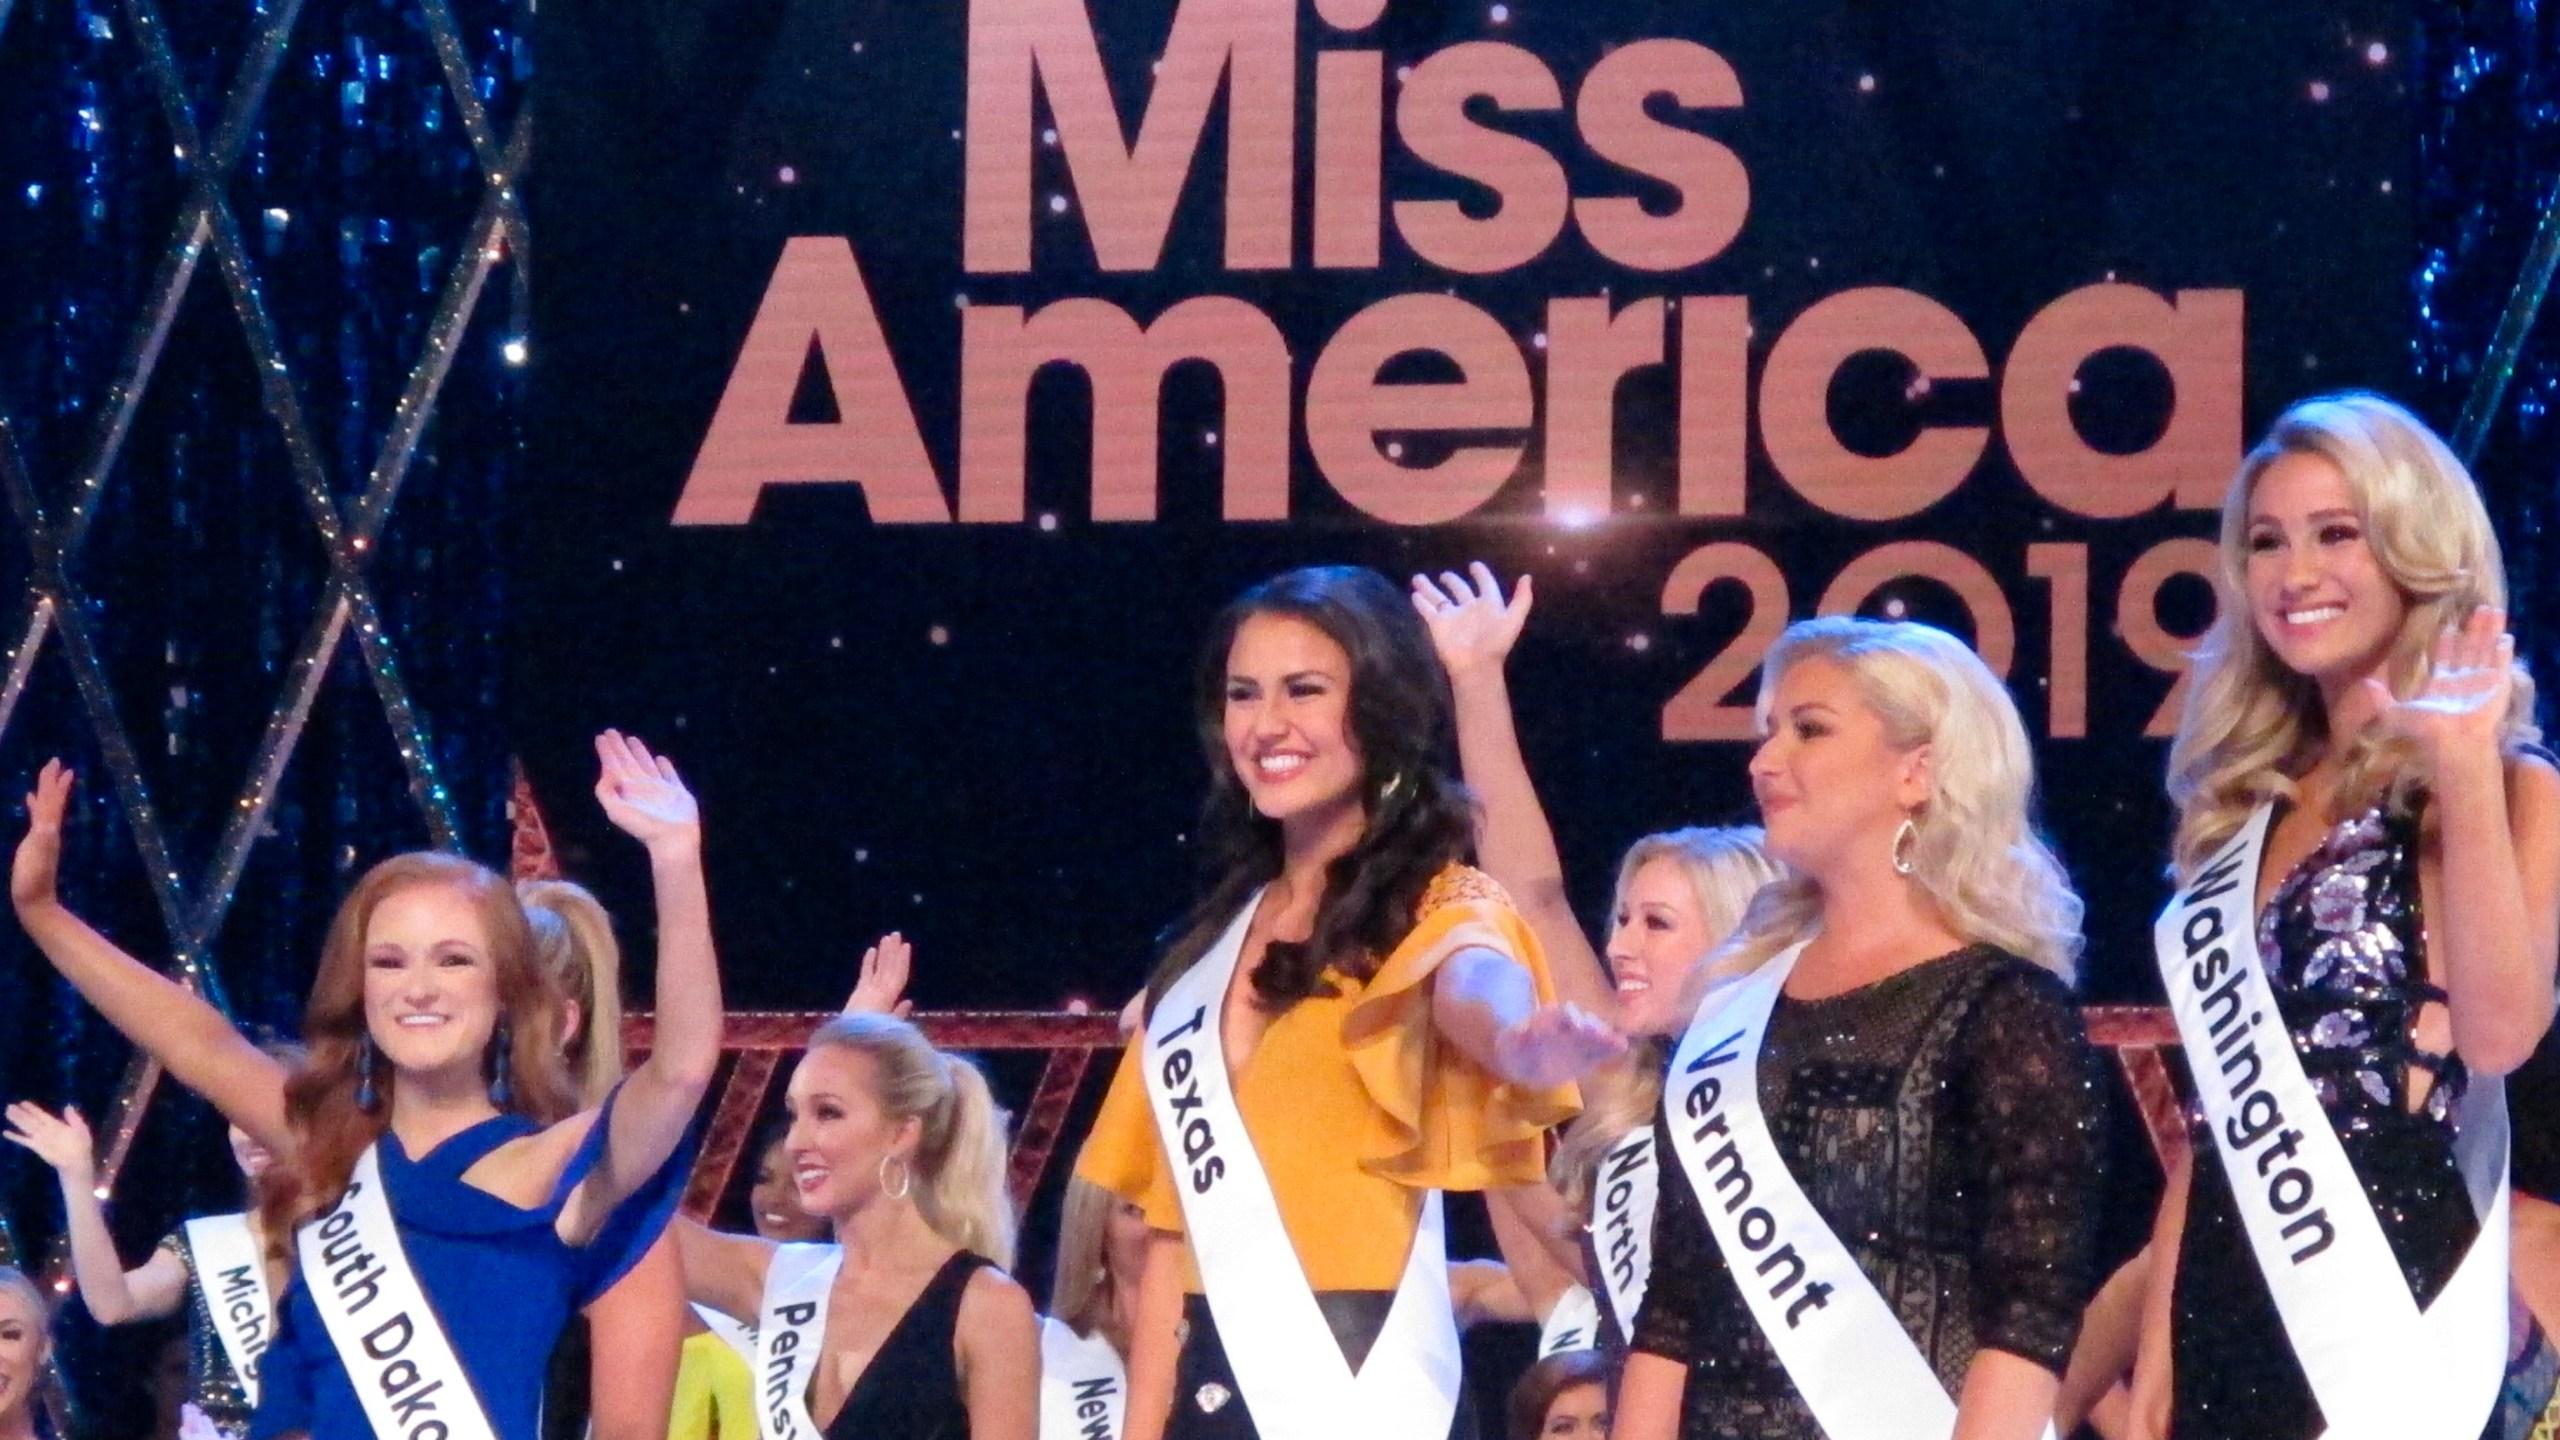 Miss_America_07896-159532.jpg39161139